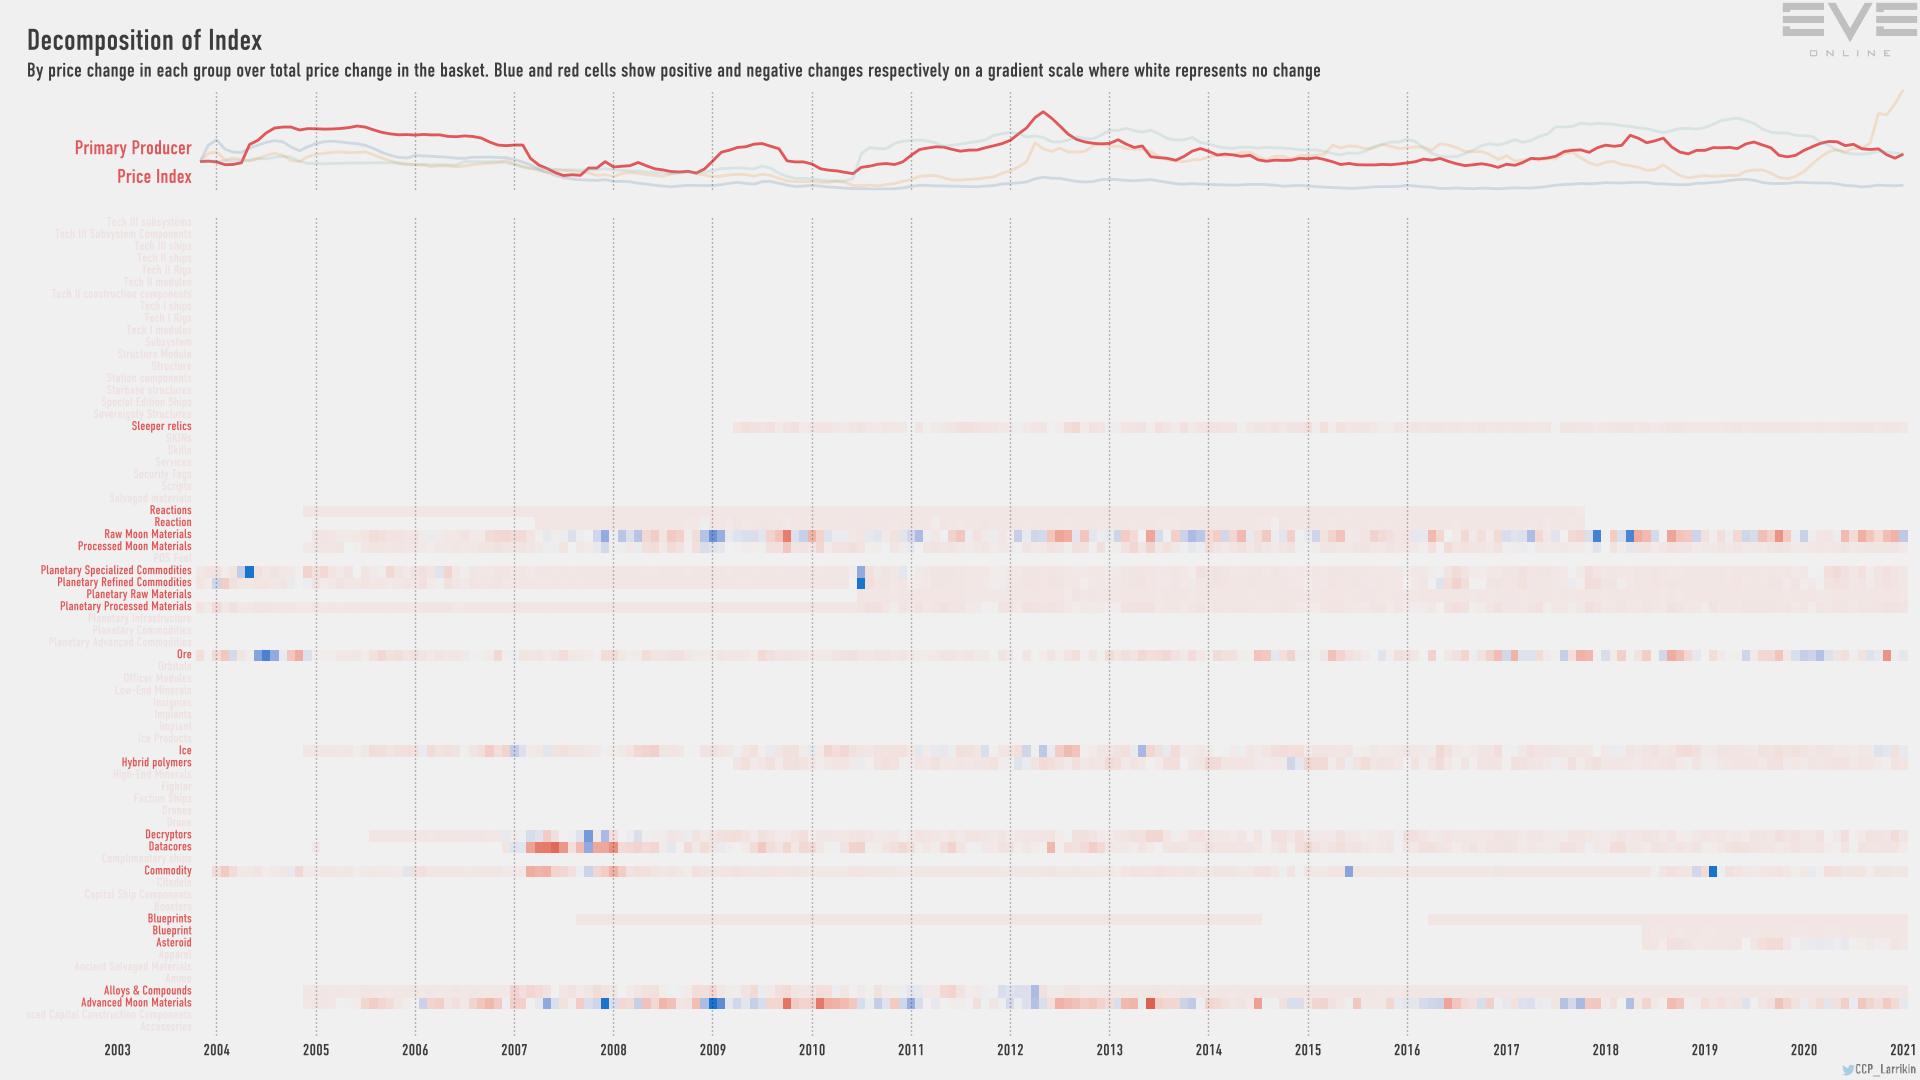 Jan2021 Index Decomp Primary Producer Price Index